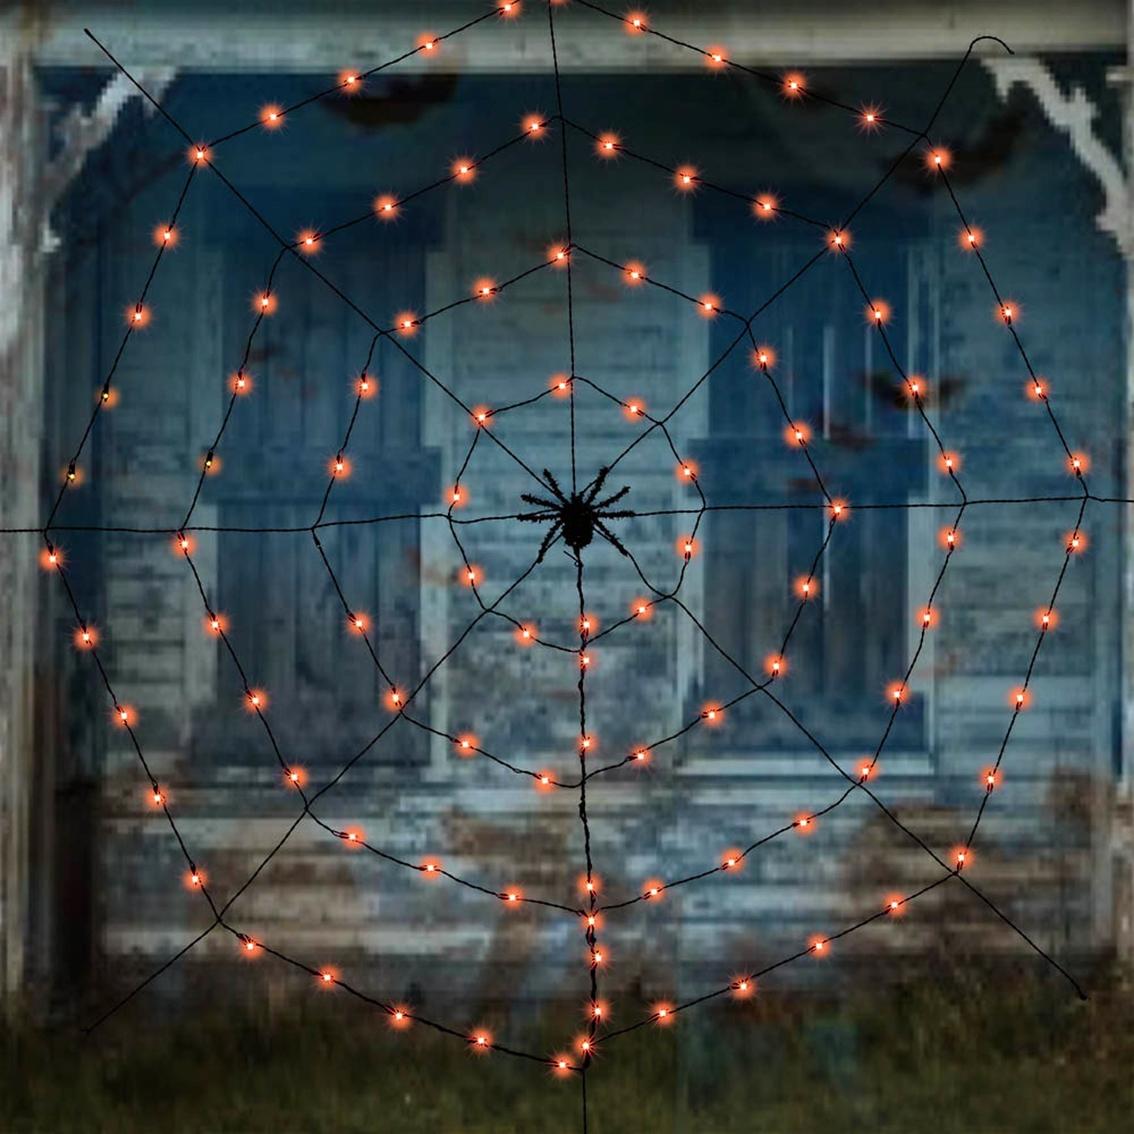 6c859c2d482 Halloween Spider Web Light Set, 7 Ft. | Halloween Outdoor Decor ...